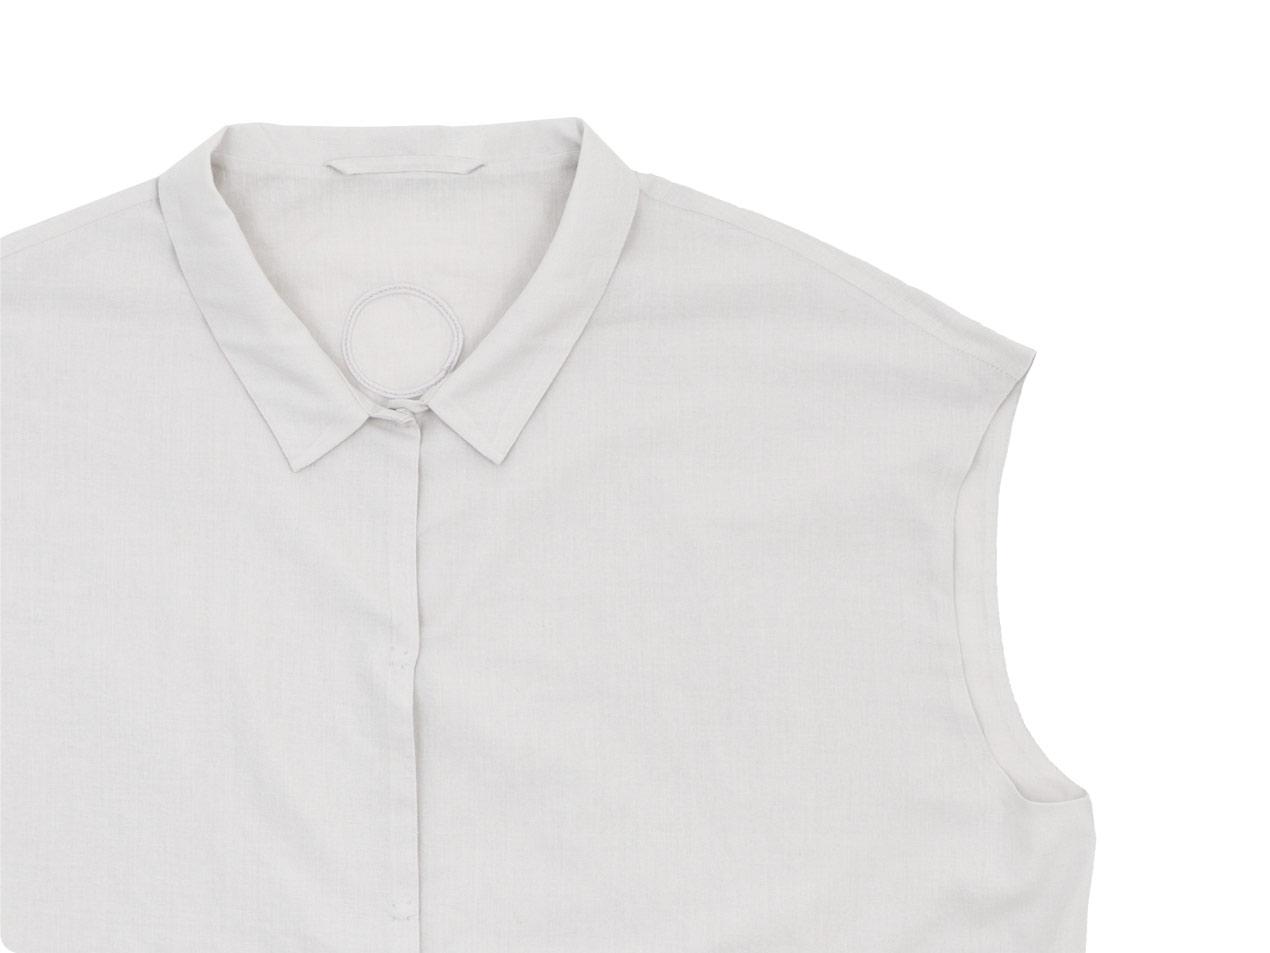 Lin francais d'antan Stuck(シュトゥック) French Sleeve Shirts